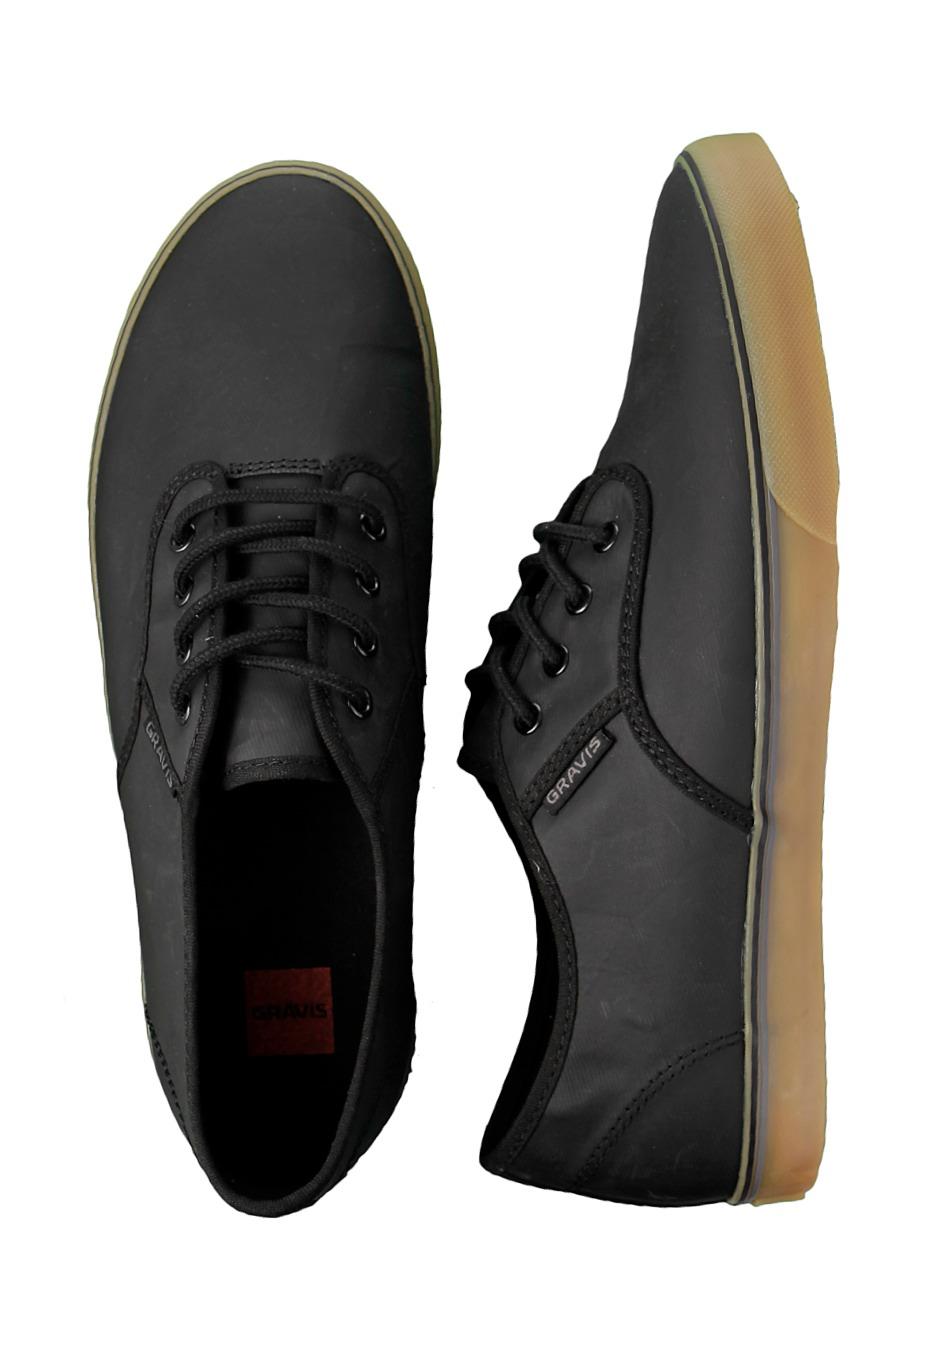 f6c51ca314ca Gravis - Slymz Black Wax - Shoes - Impericon.com UK